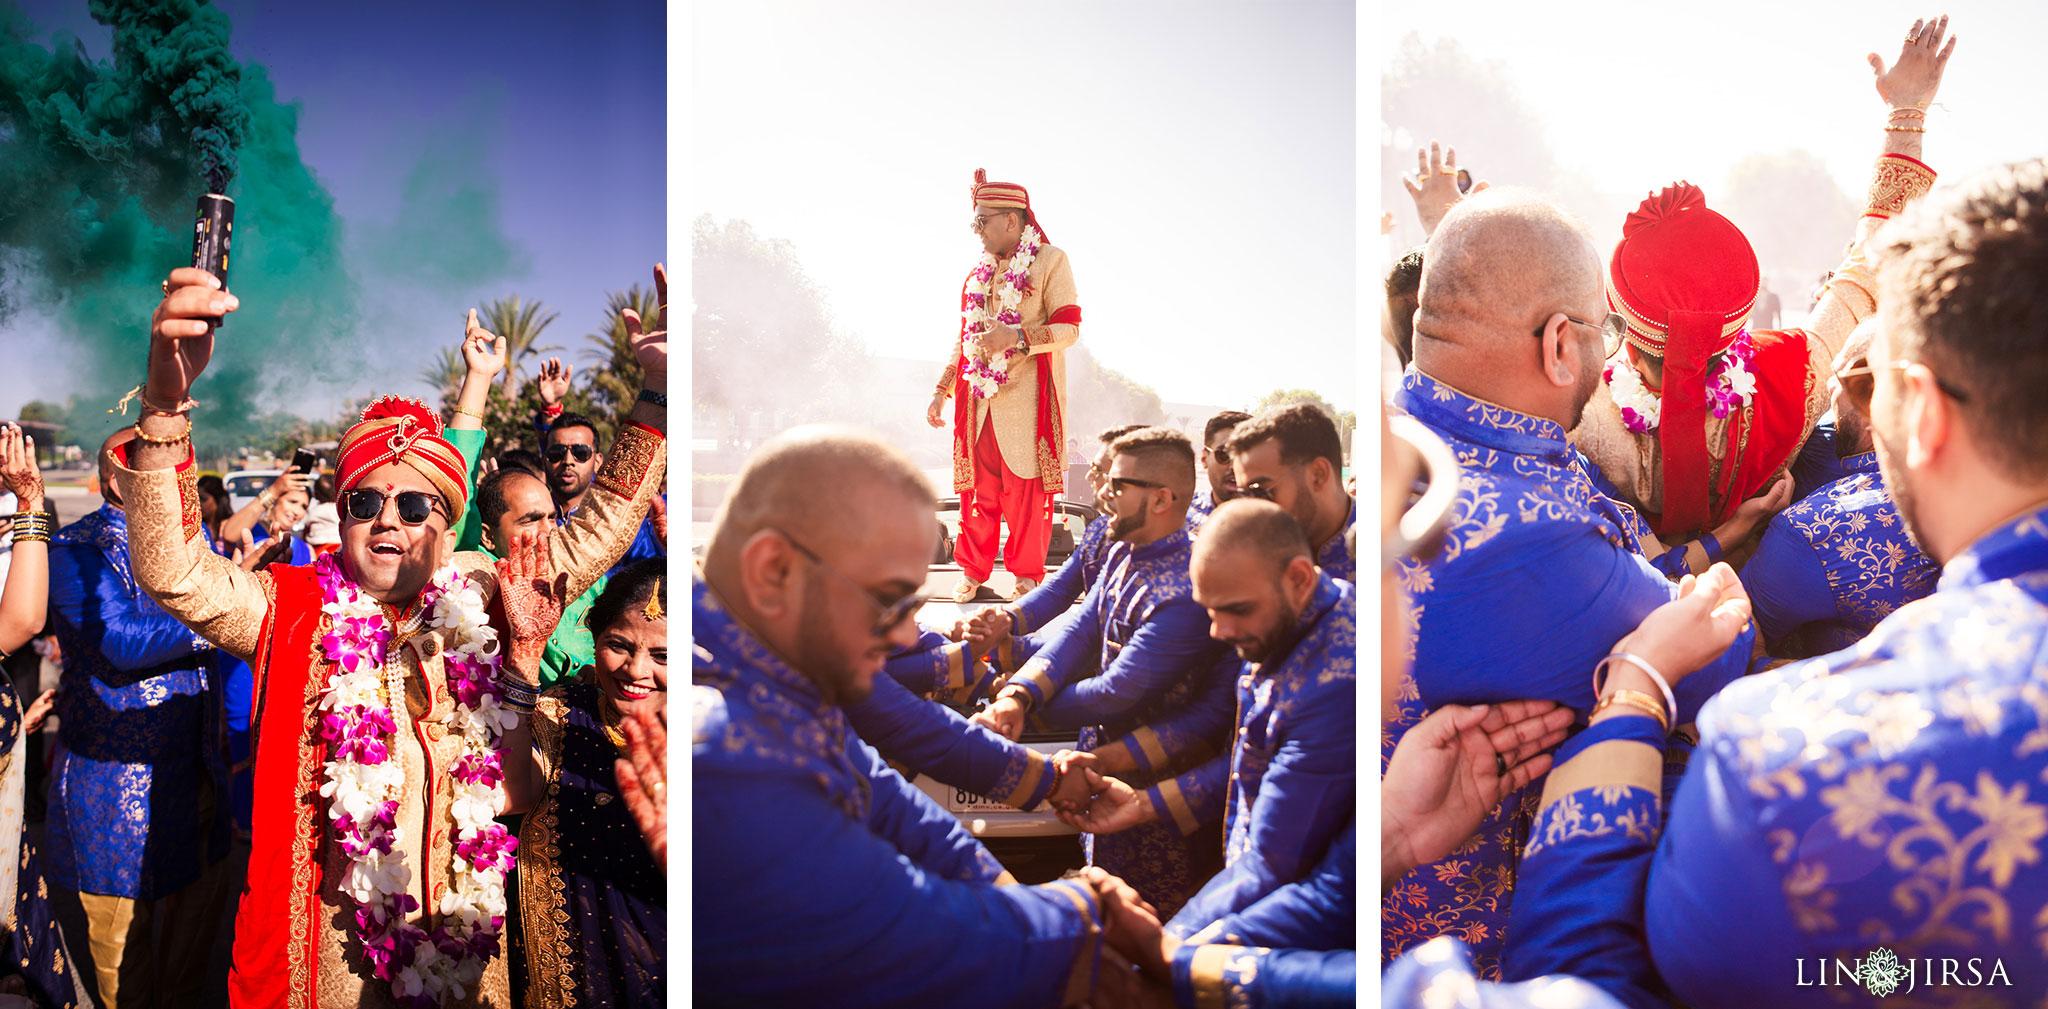 079 BAPS Swaminarayan Sanstha Chino Hills Indian Wedding Photography